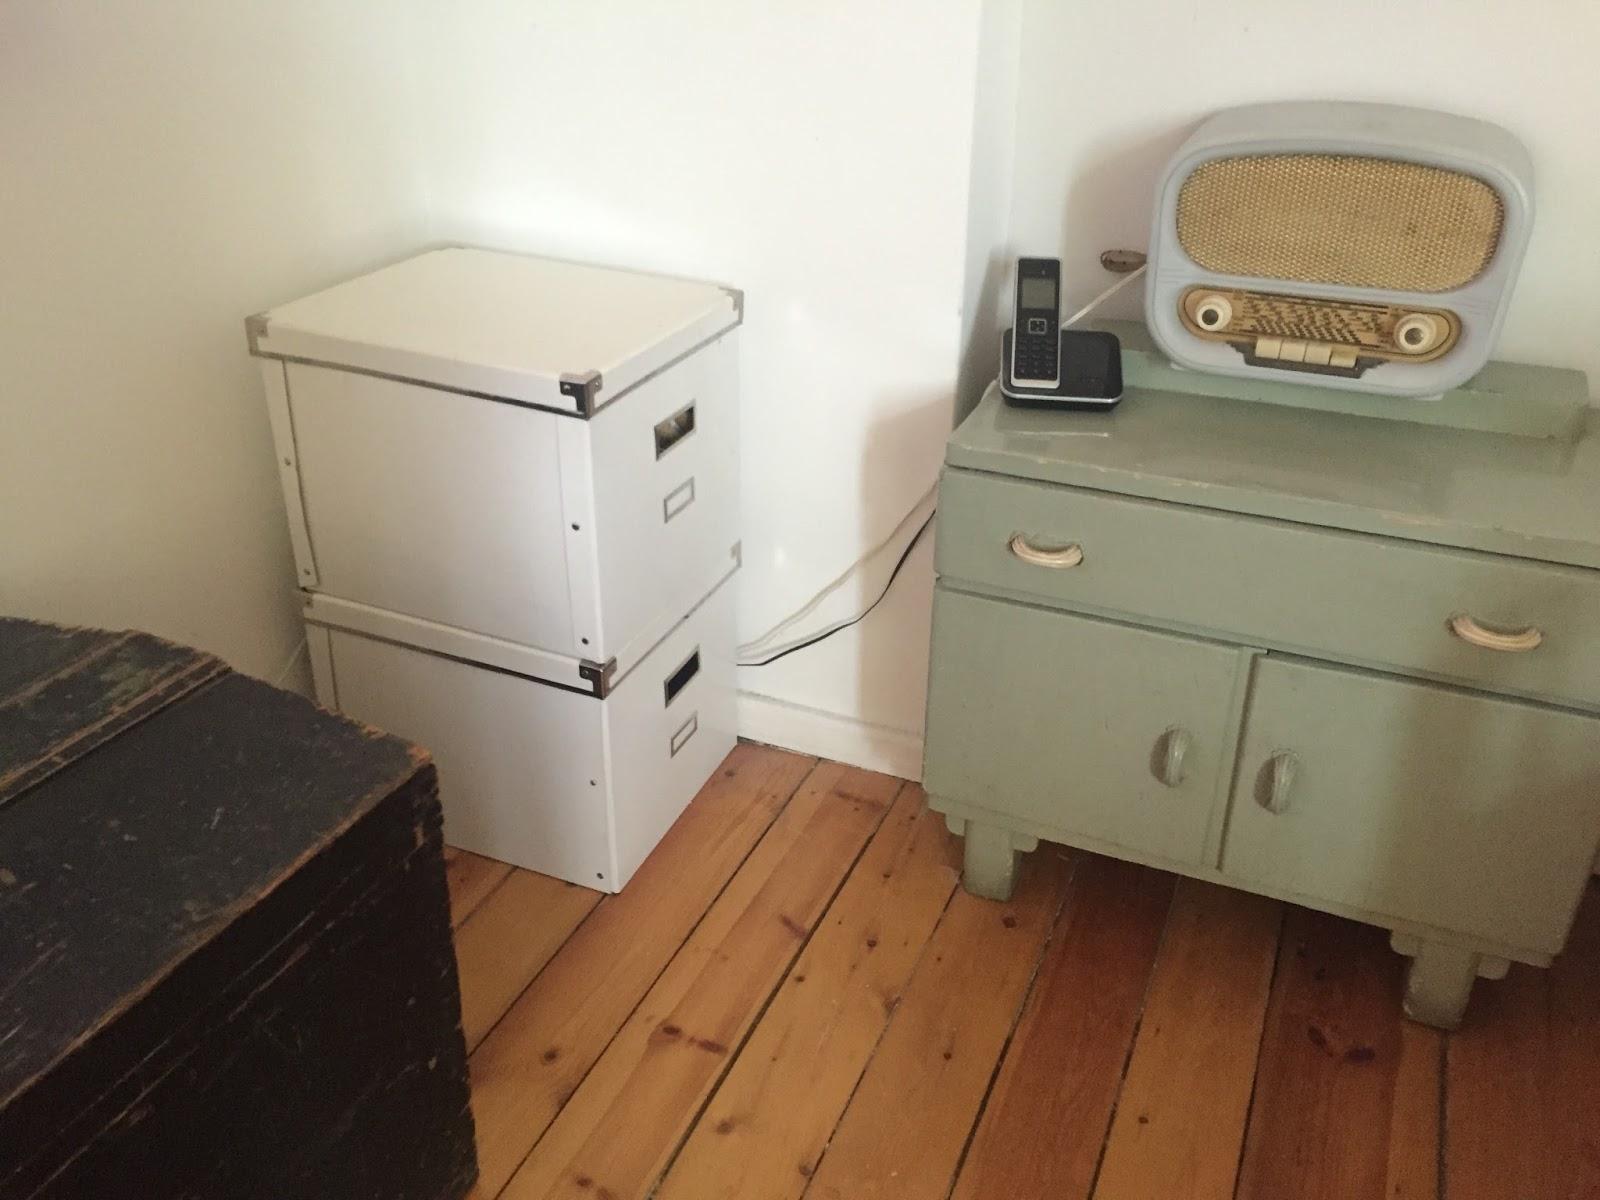 kabelbox diy meiliese. Black Bedroom Furniture Sets. Home Design Ideas